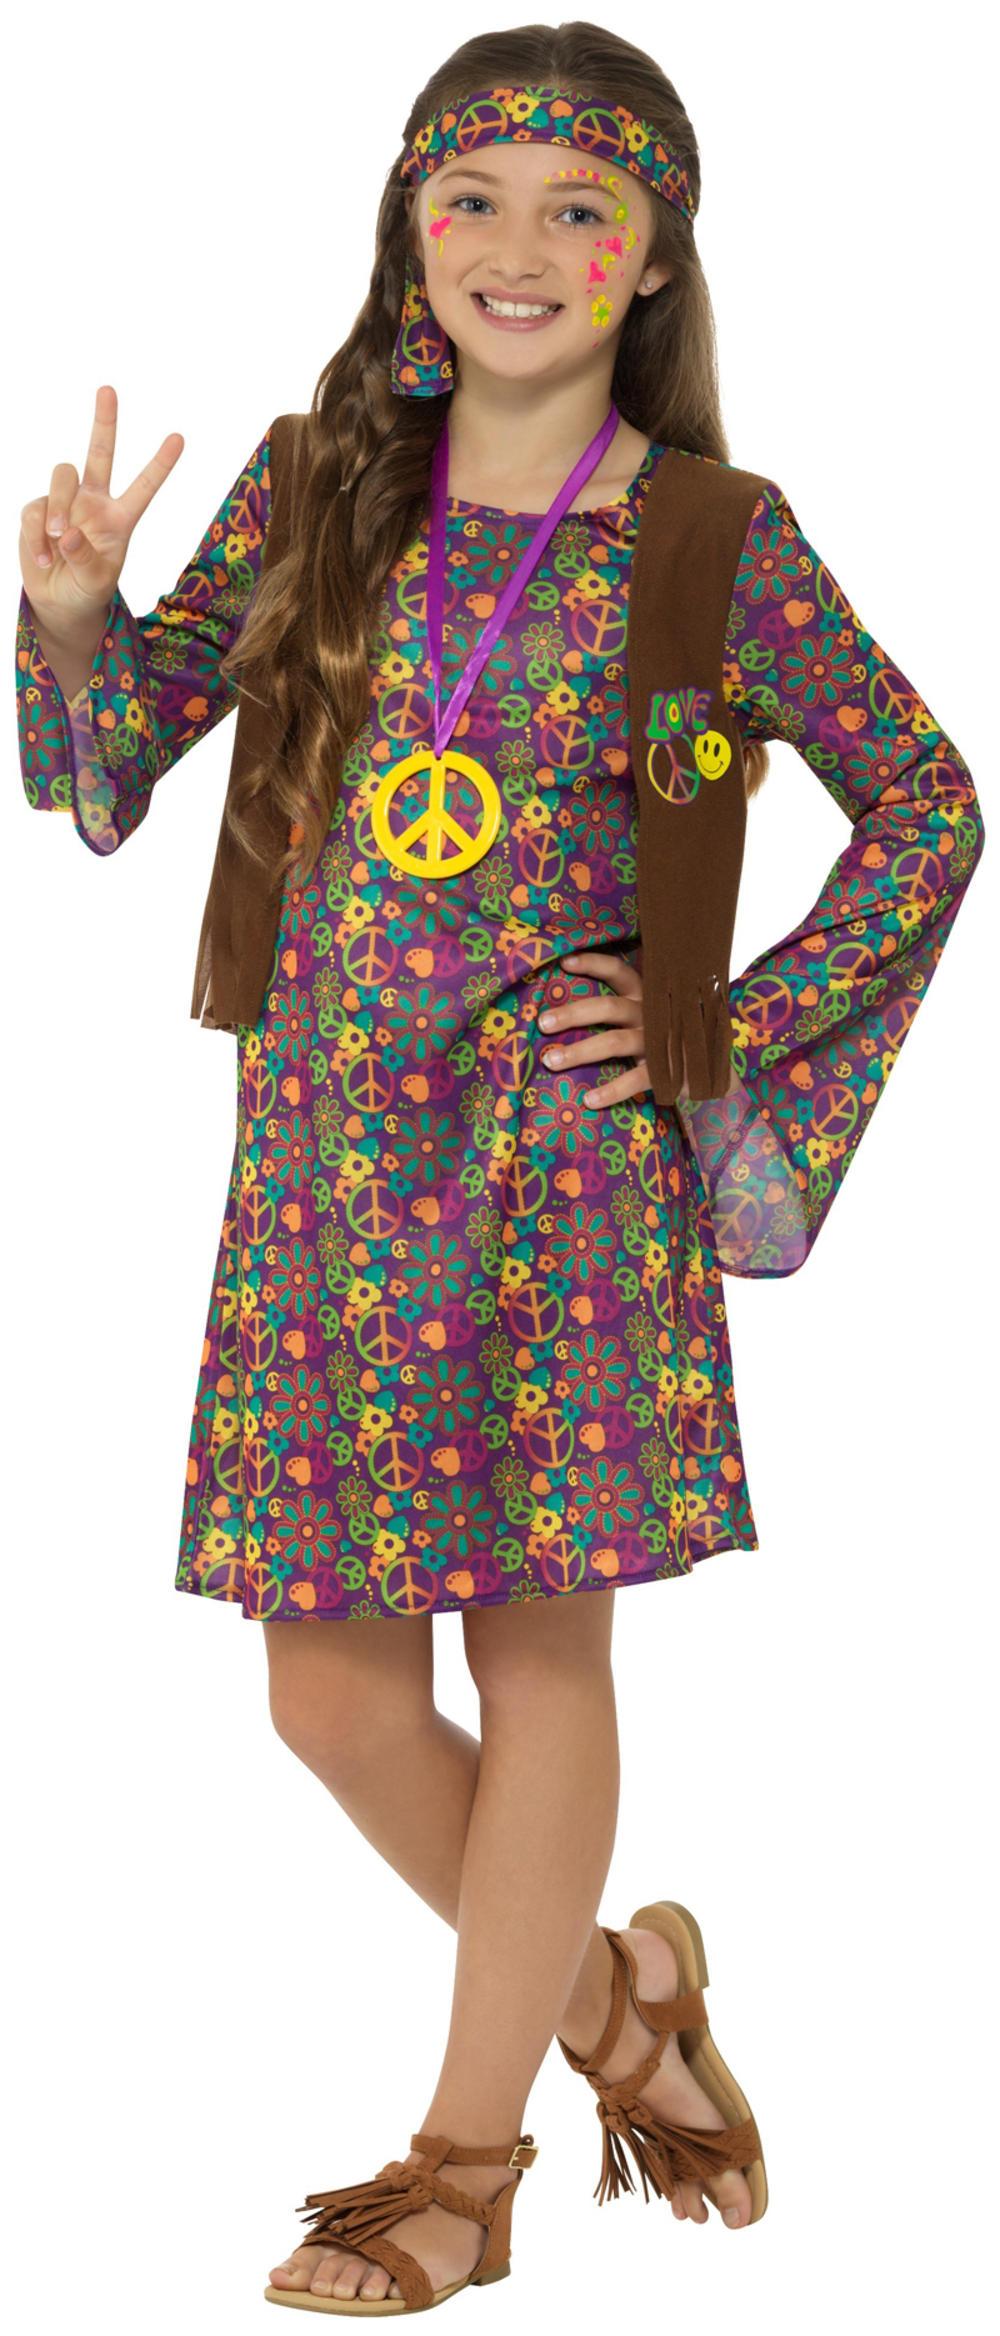 Hippie Girls Fancy Dress 1960s 1970s Peace Flower Power Hippy Kids Child Costume